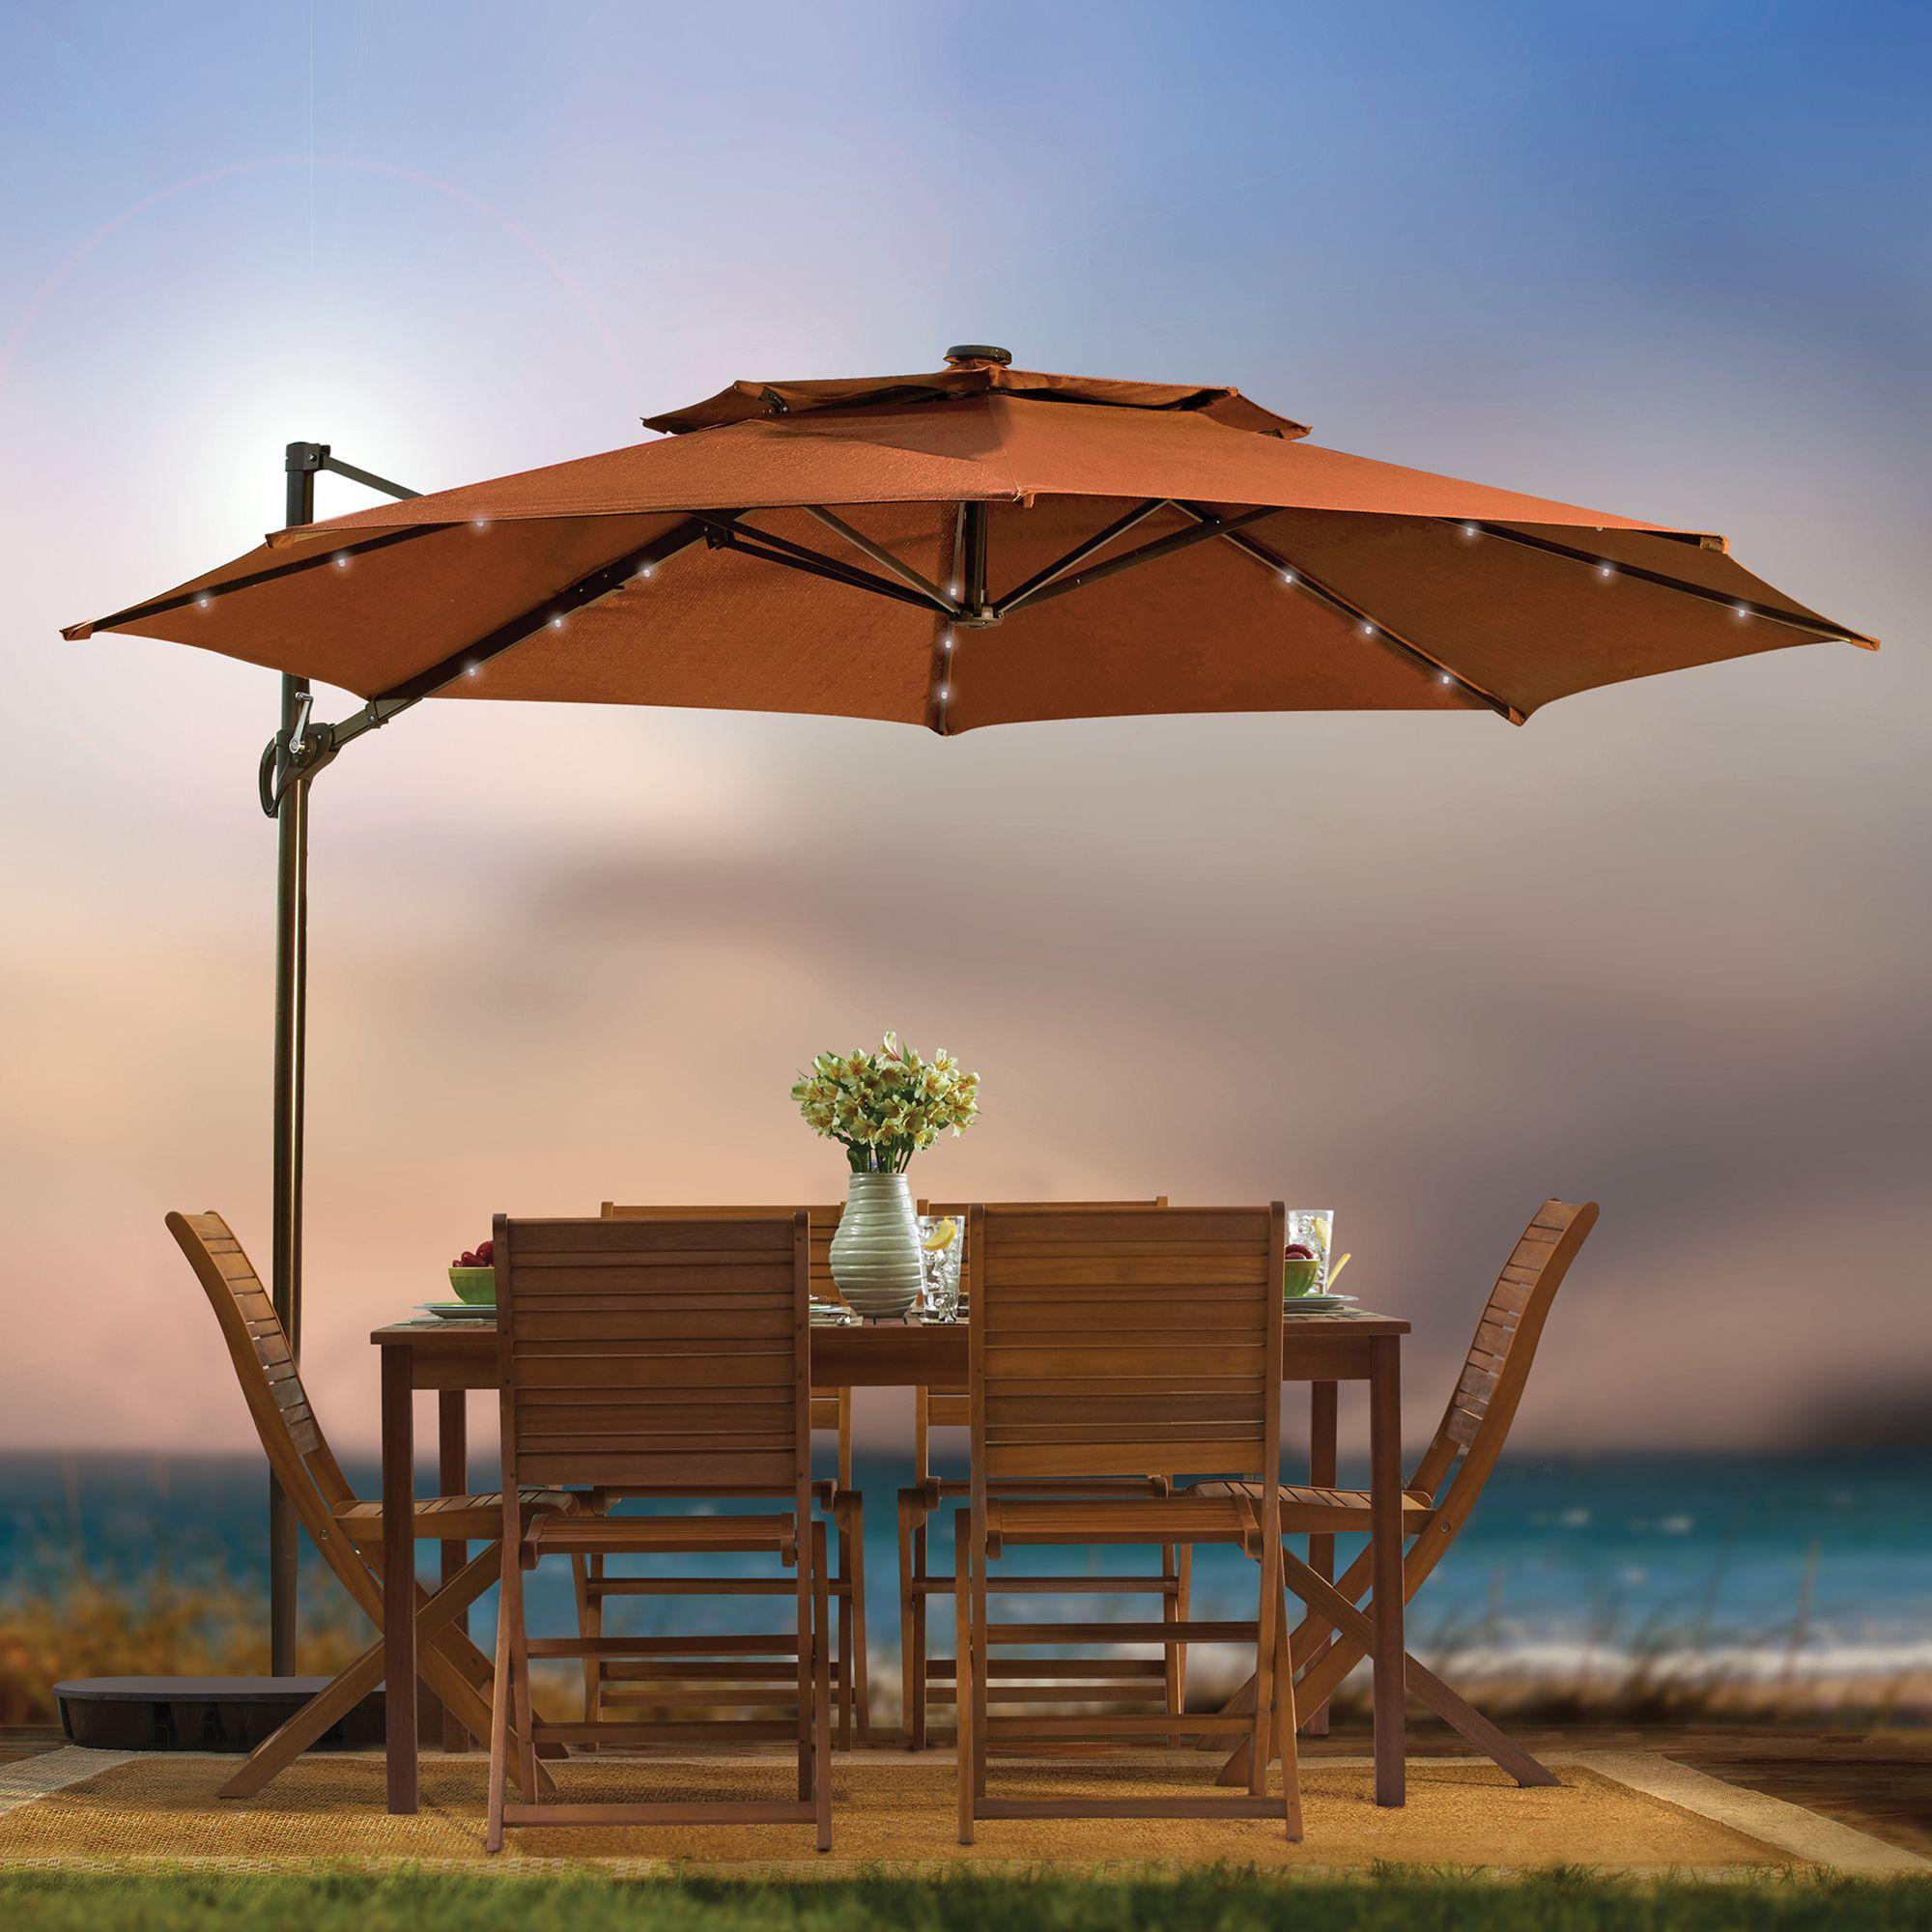 11 Foot Ft Round Umbrella Cantilever Tilting Offset Solar